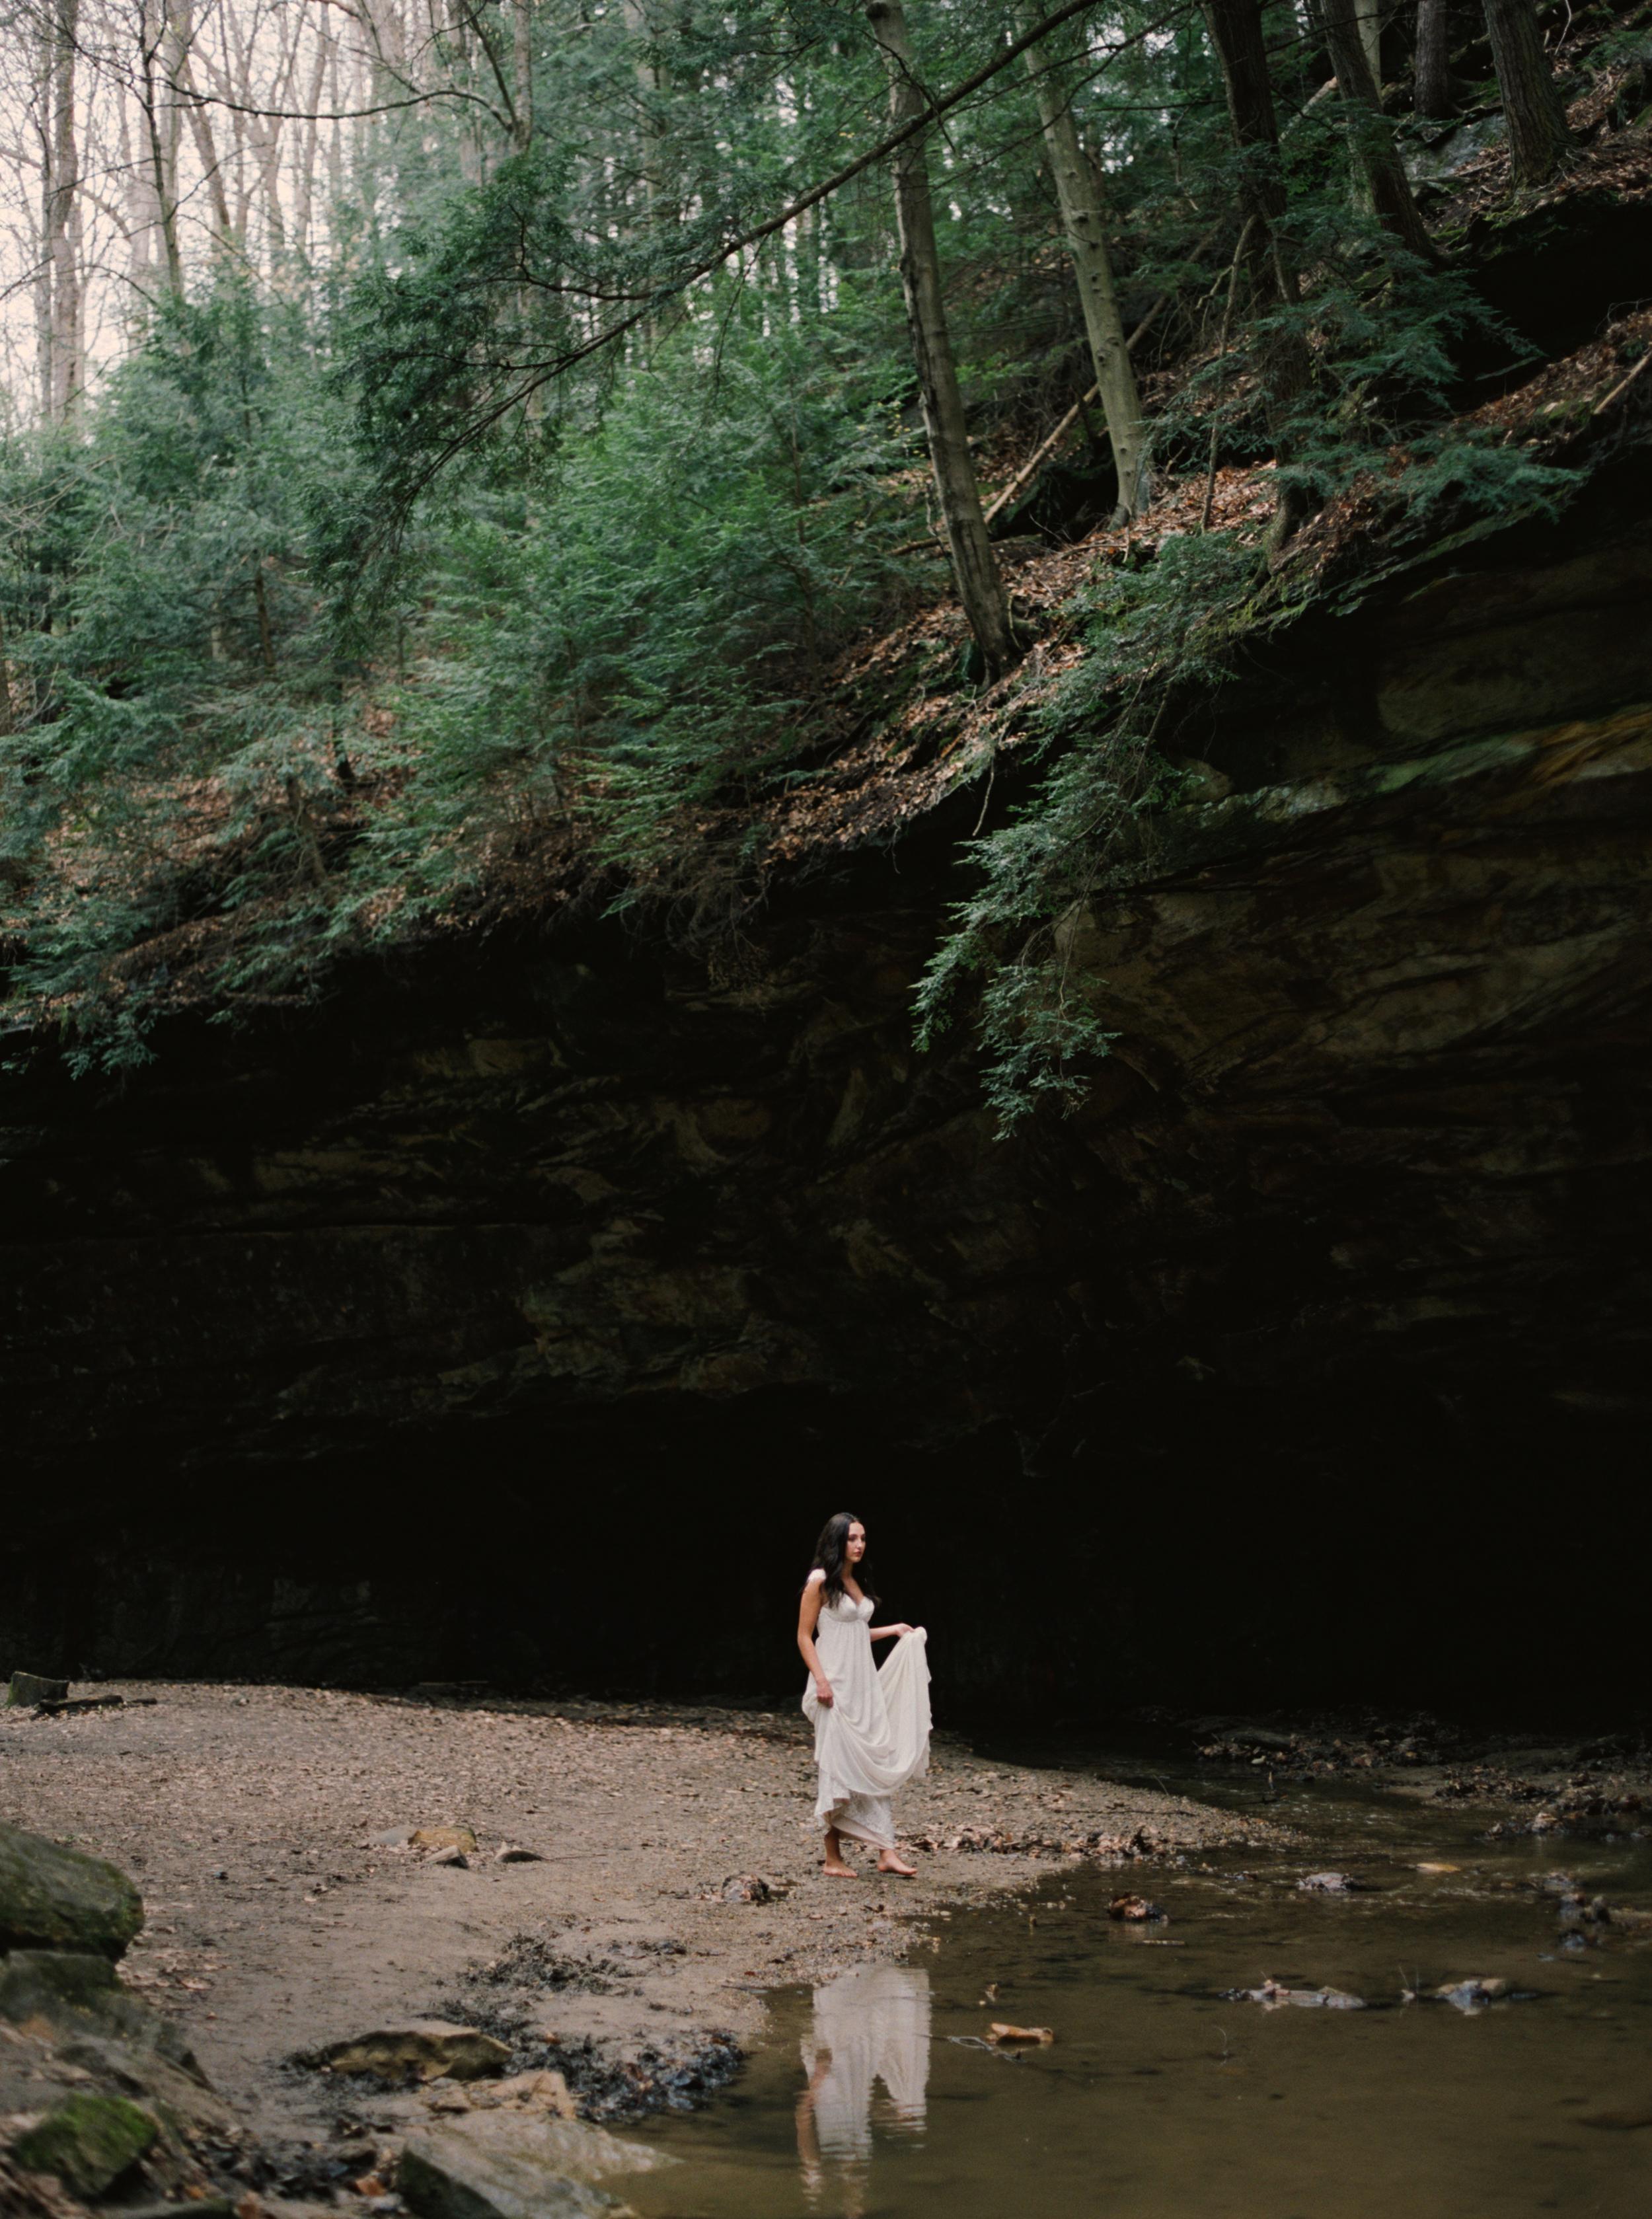 Kyle John l Fine Art Wedding Photography l Chicago, Copenhagen, California, New York, Destination l Blog l AK_8